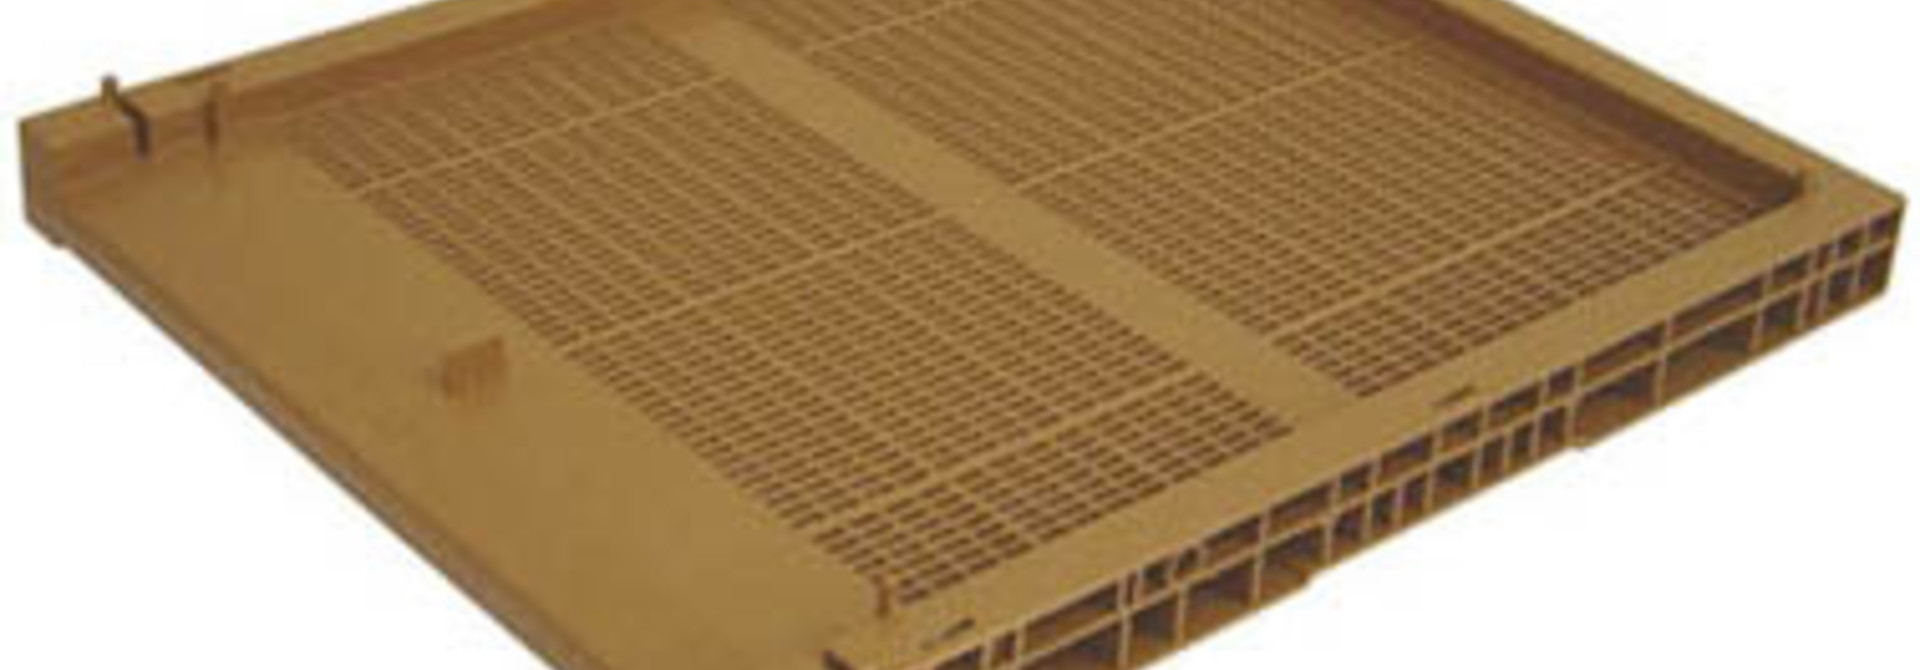 PVC Nicot dadant bodem volledige verluchting